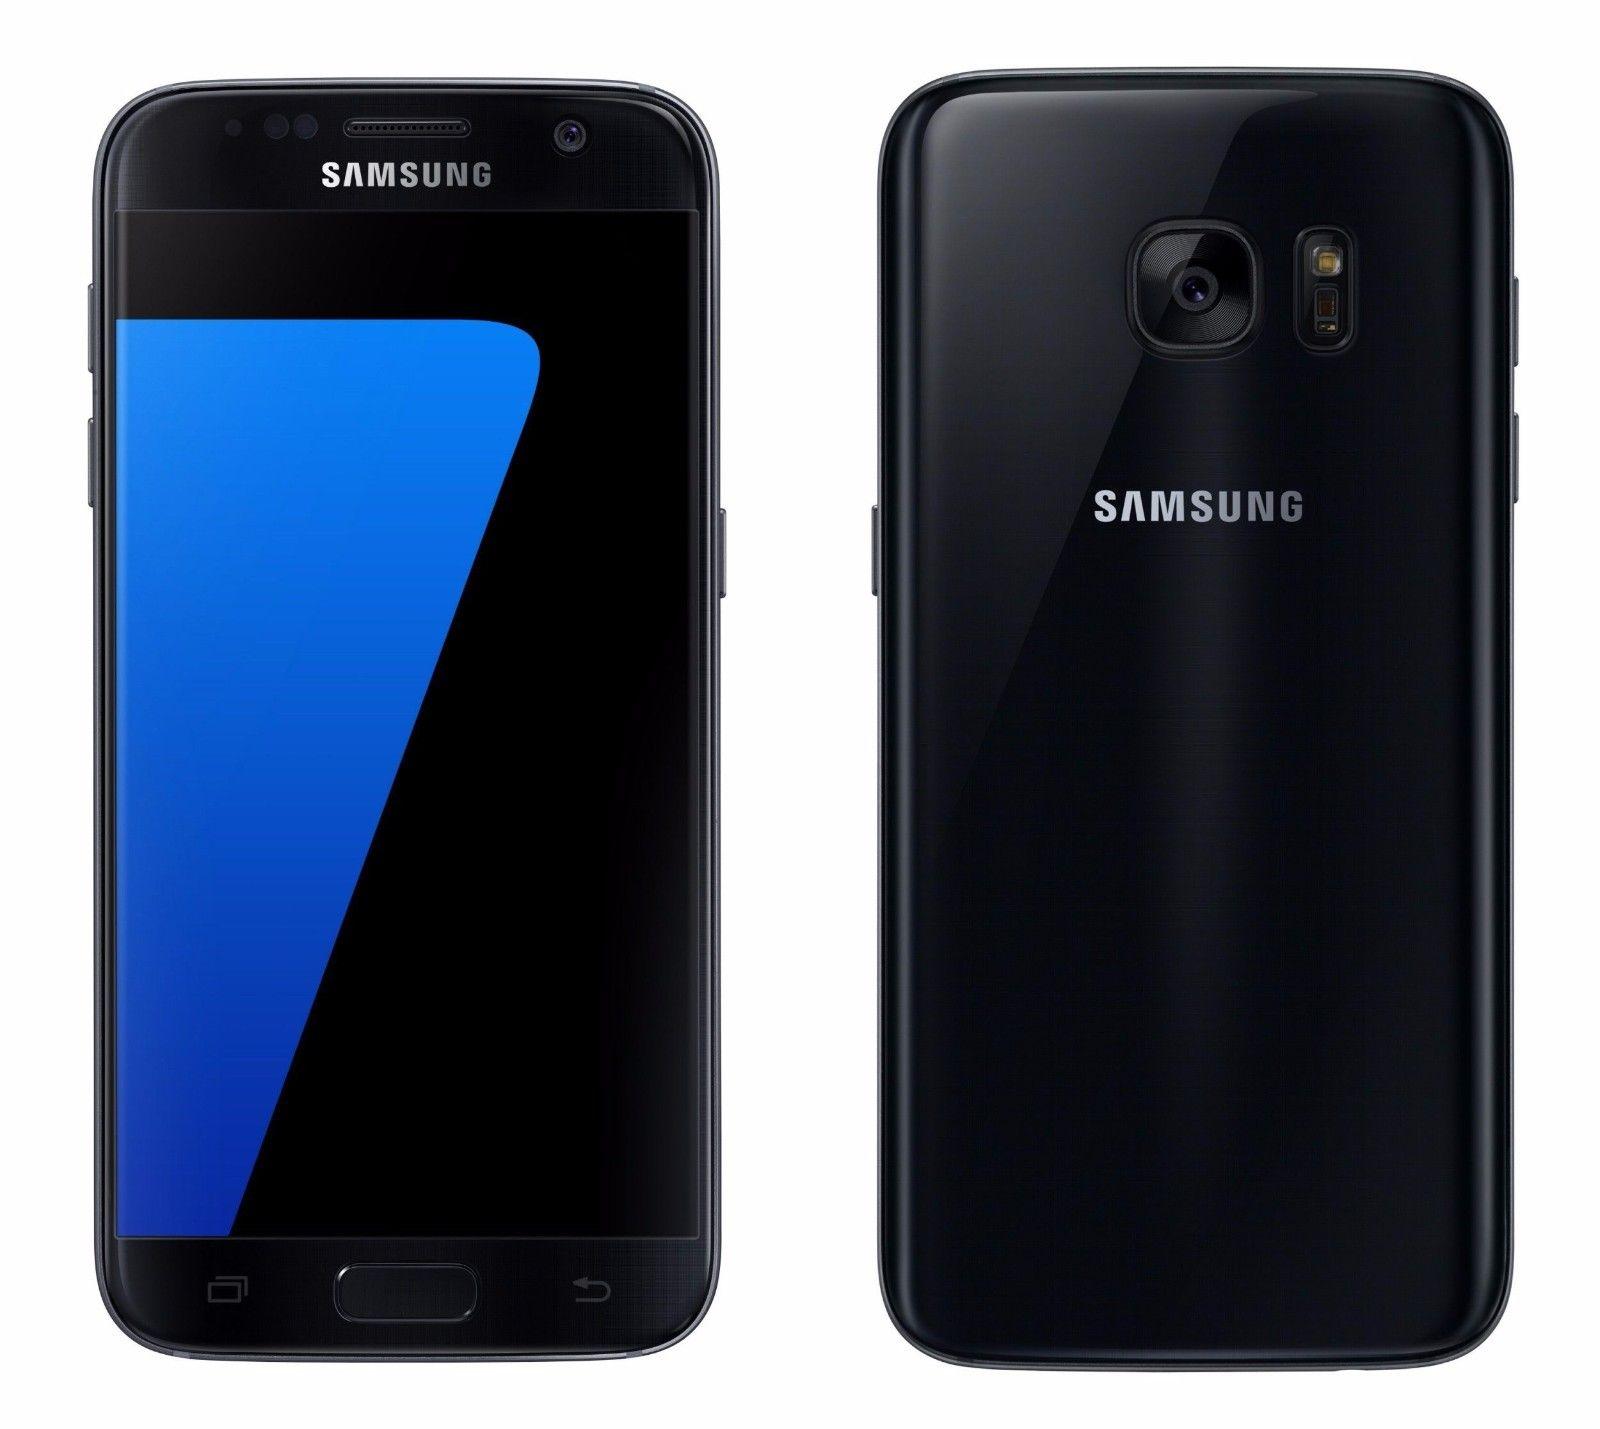 Ebay: Samsung Galaxy S7 32GB G930P (GSM Unlocked) 4G LTE 12MP Smartphone Black A